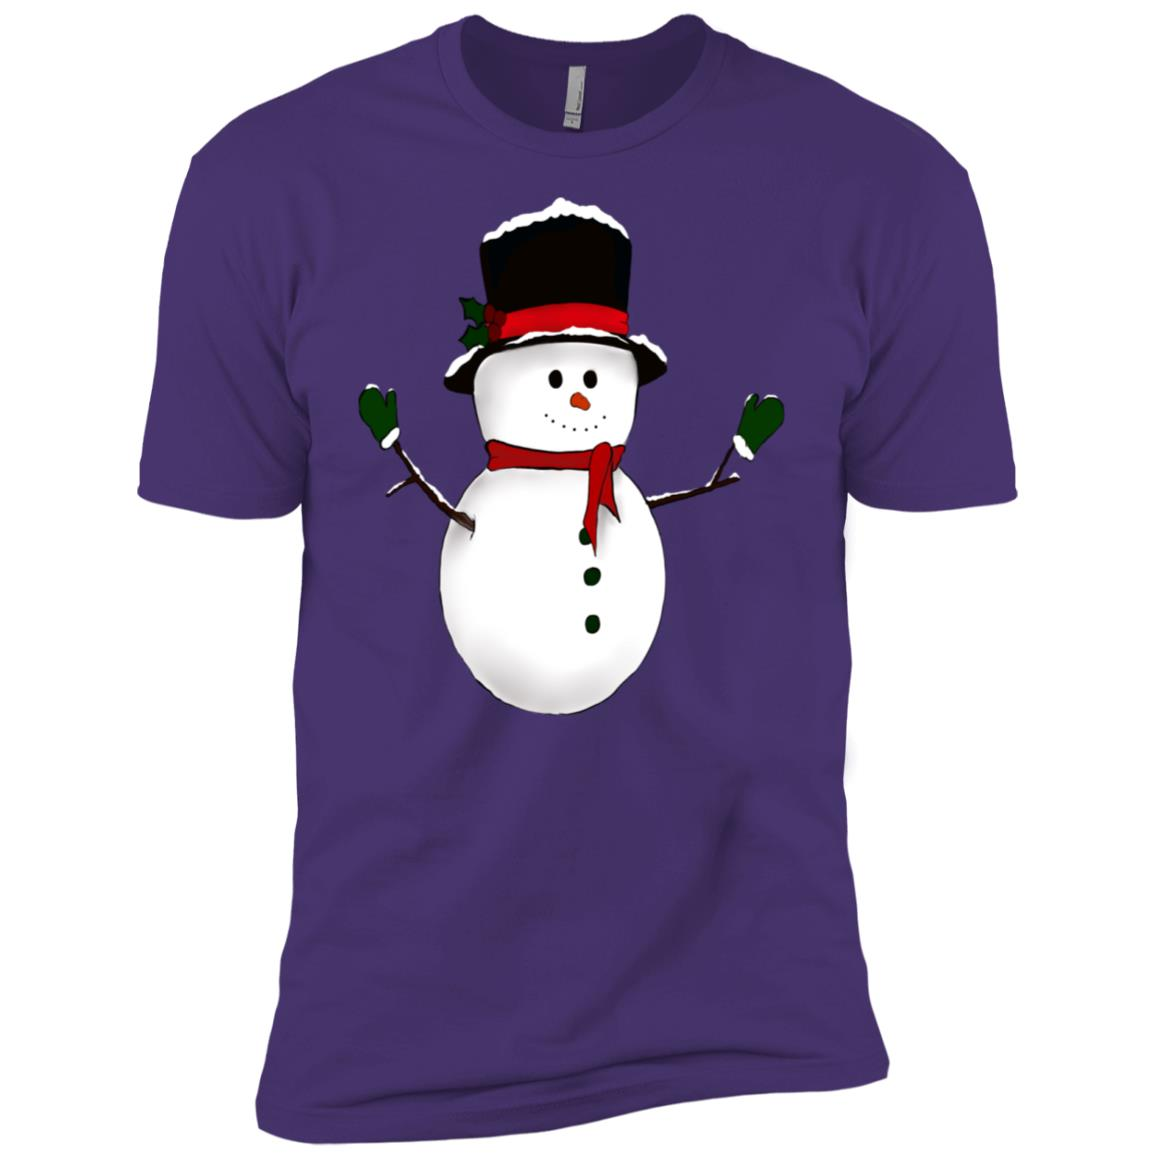 Snowman Holiday Christmas Men Short Sleeve T-Shirt